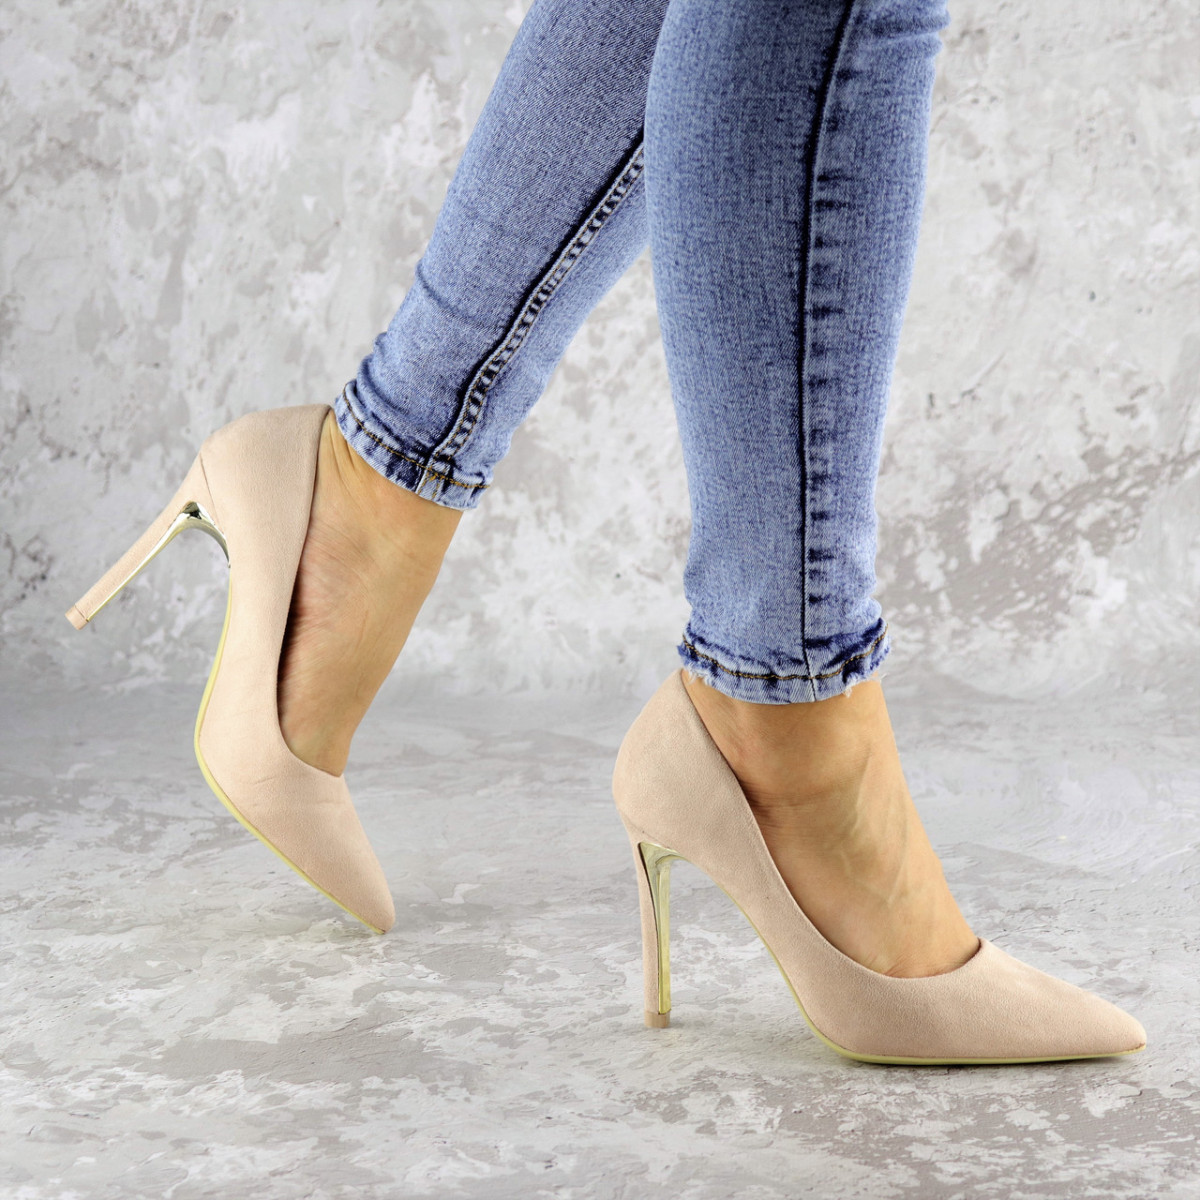 Туфли женские на каблуке розовые Devin 2248 (37 размер)